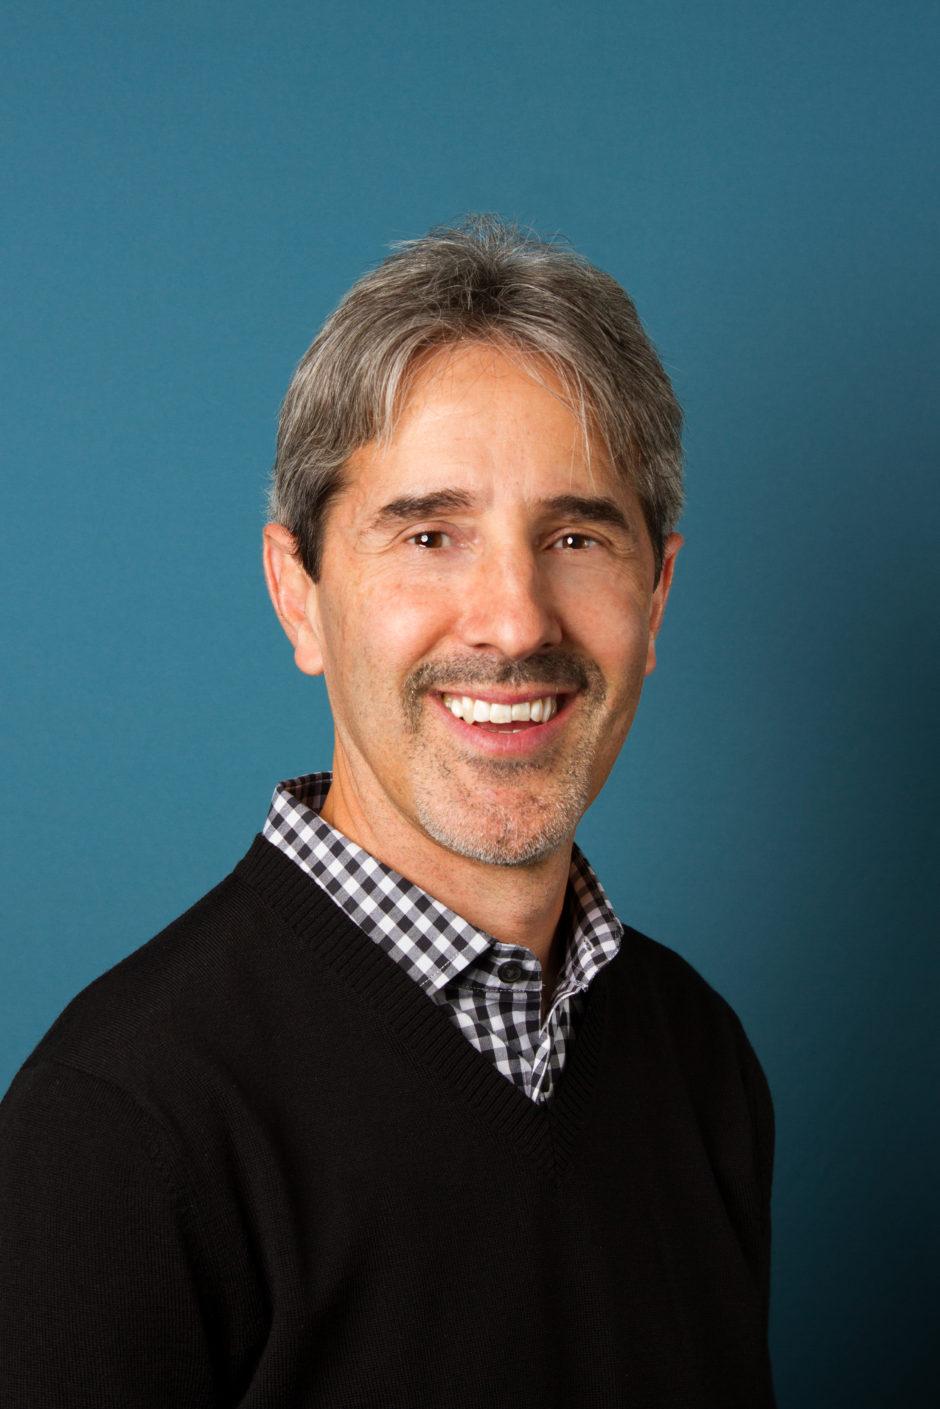 Joel Gendelman, Chief Executive Officer